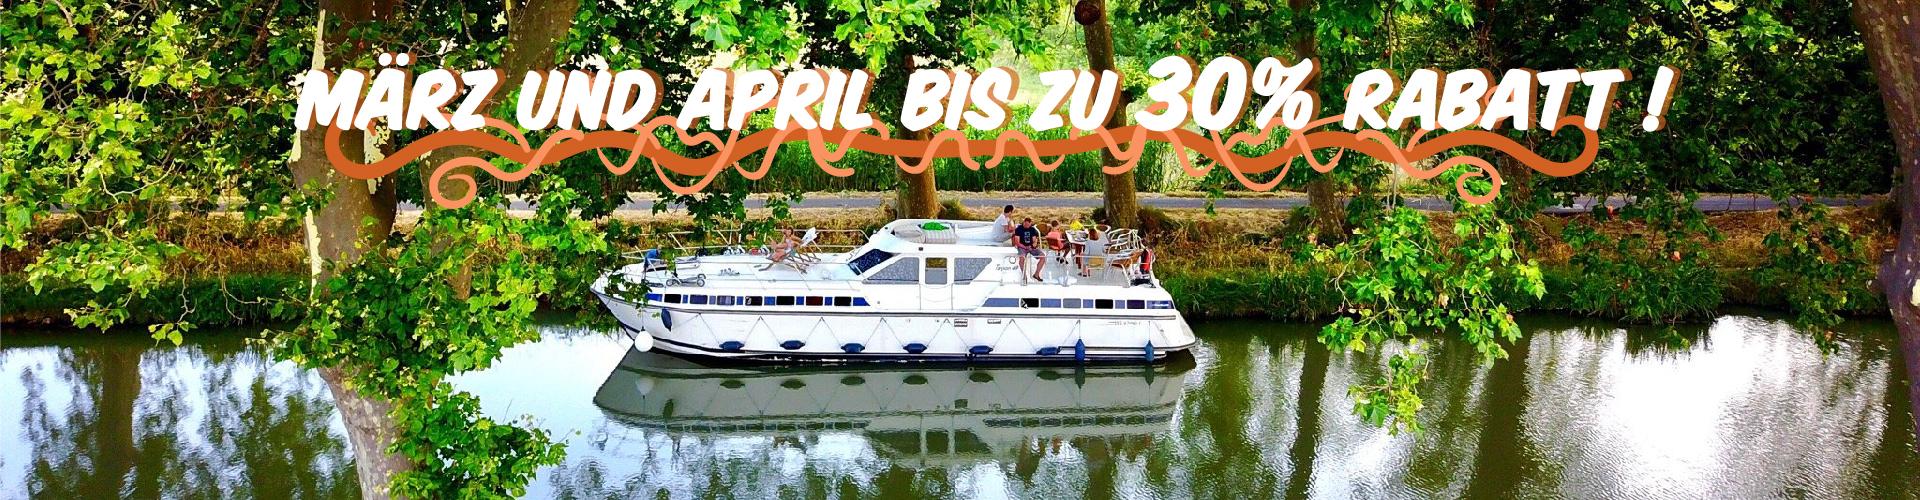 Promotion printemps mars avril 2020